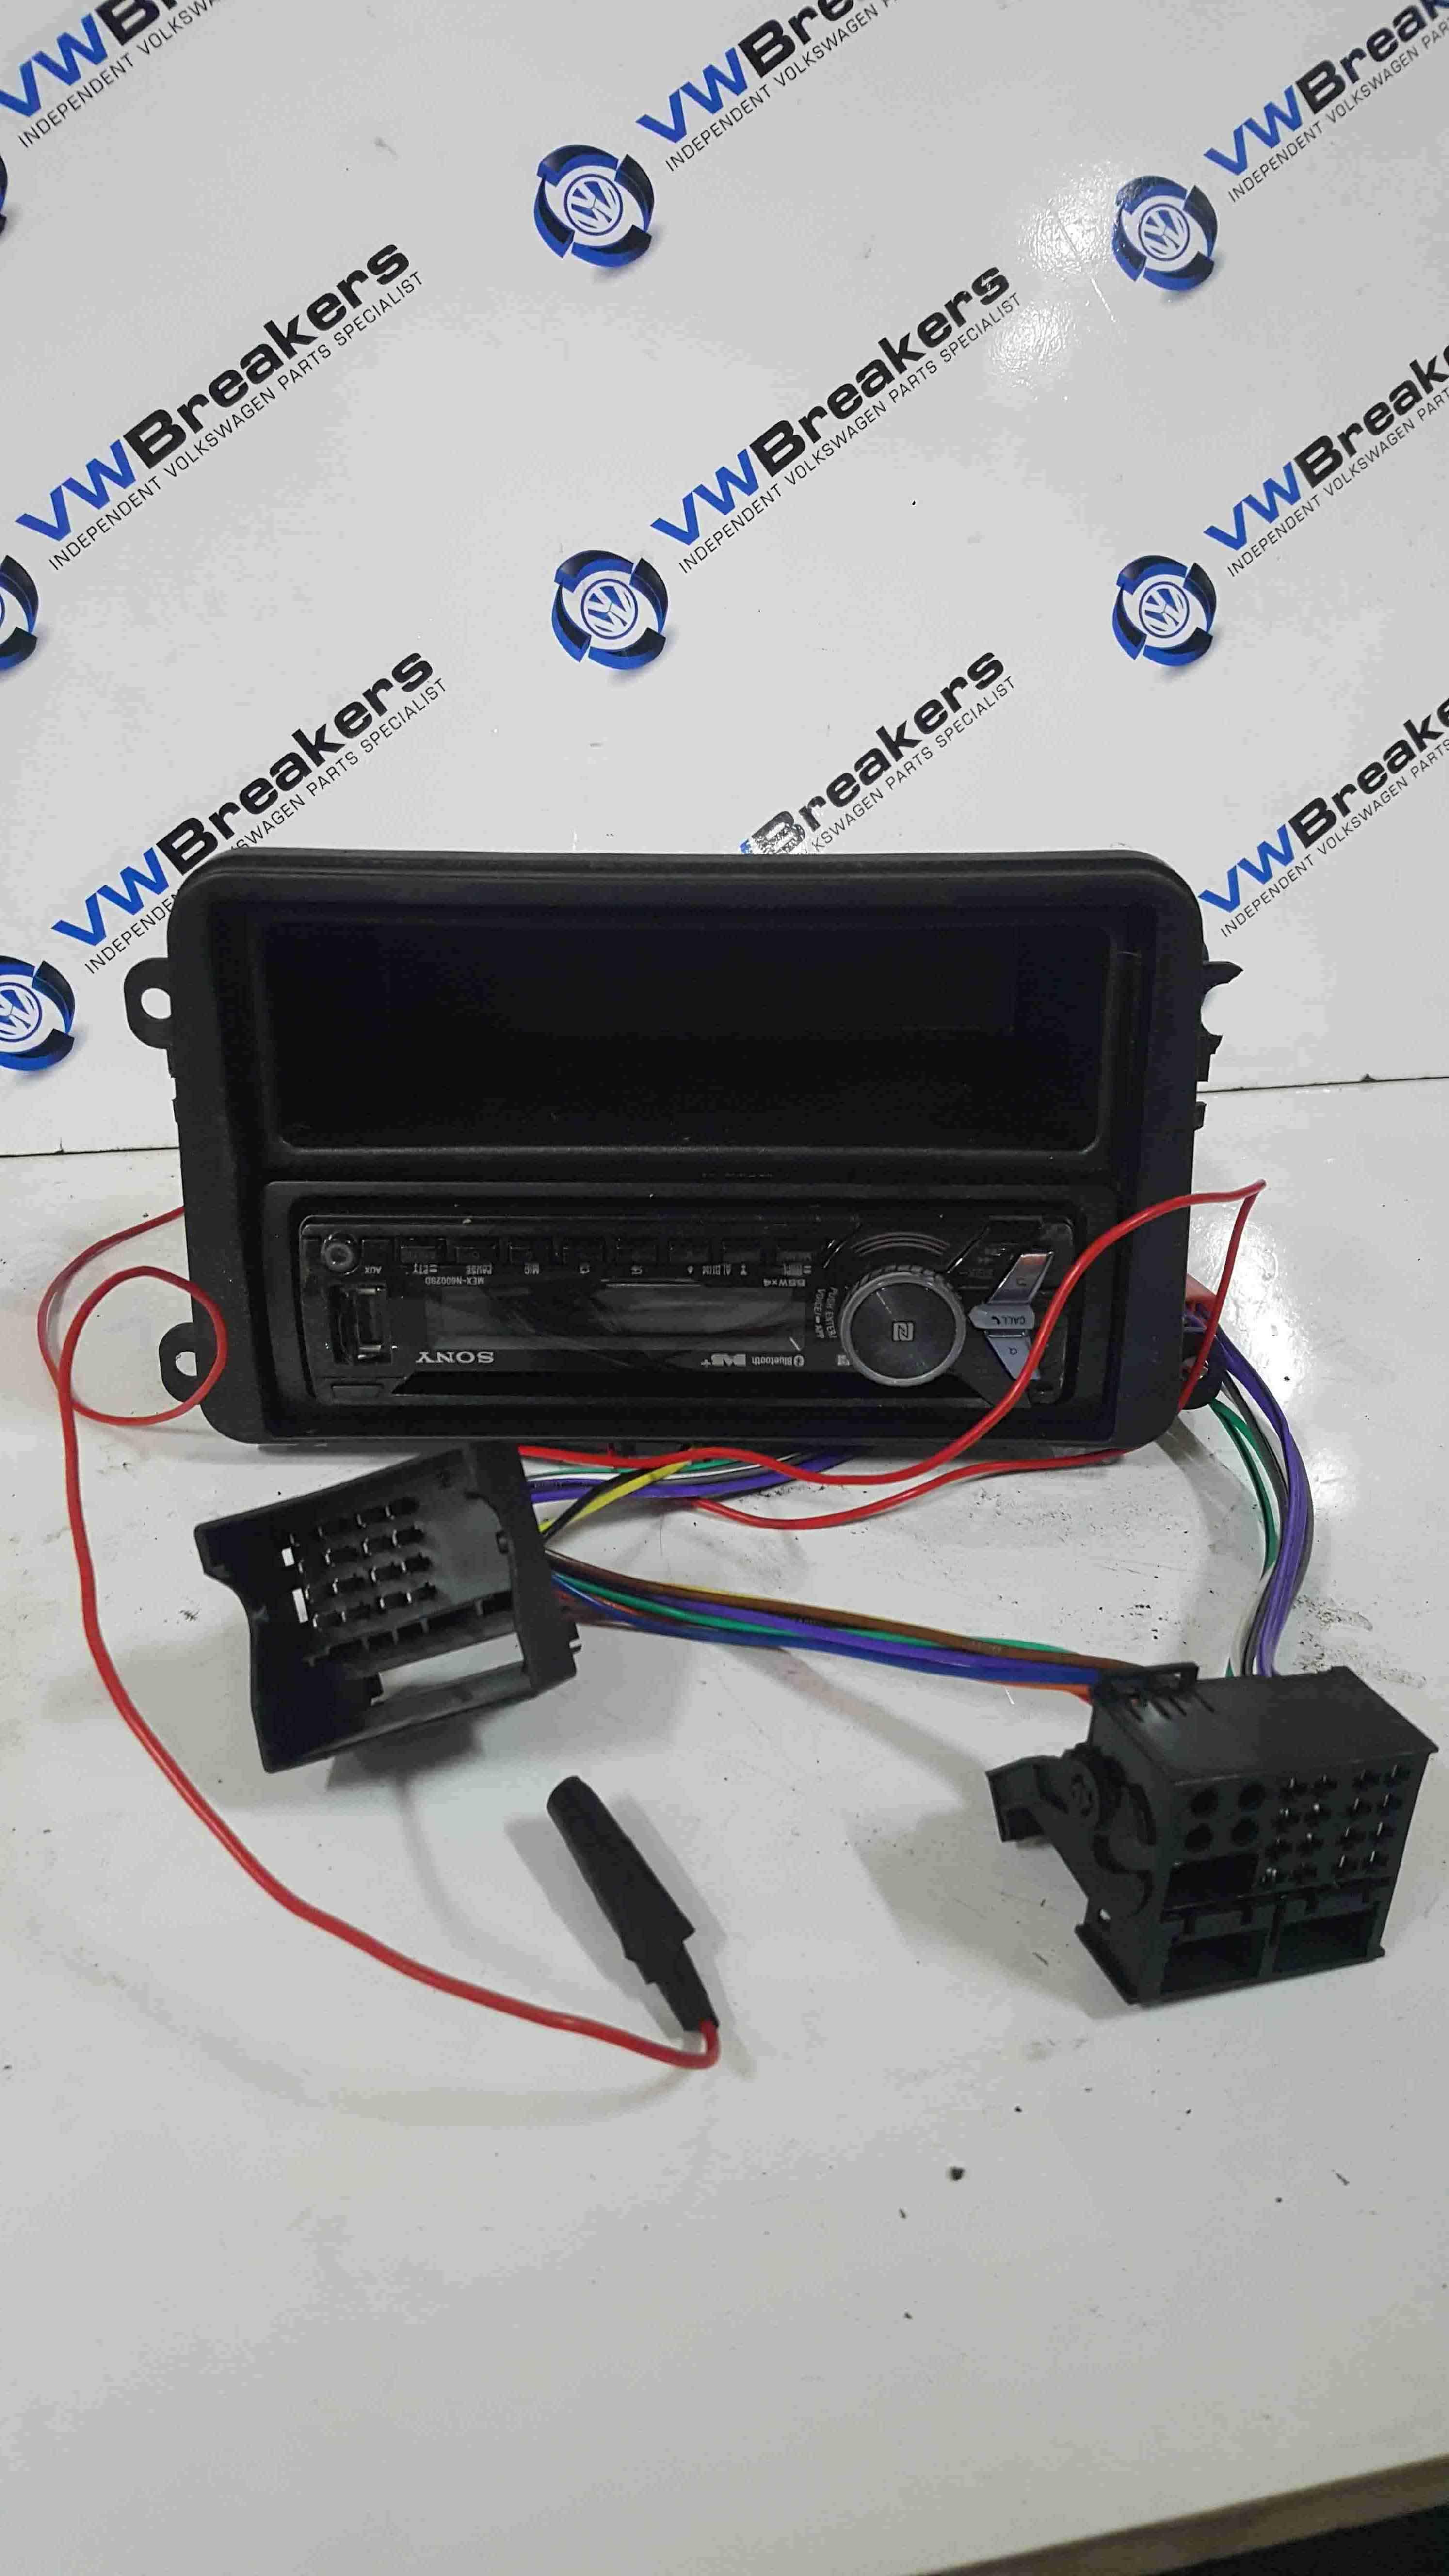 Volkswagen Golf MK5 2003-2009 Sony Radio Cd Player Bluetooth DAB MEXN60028D